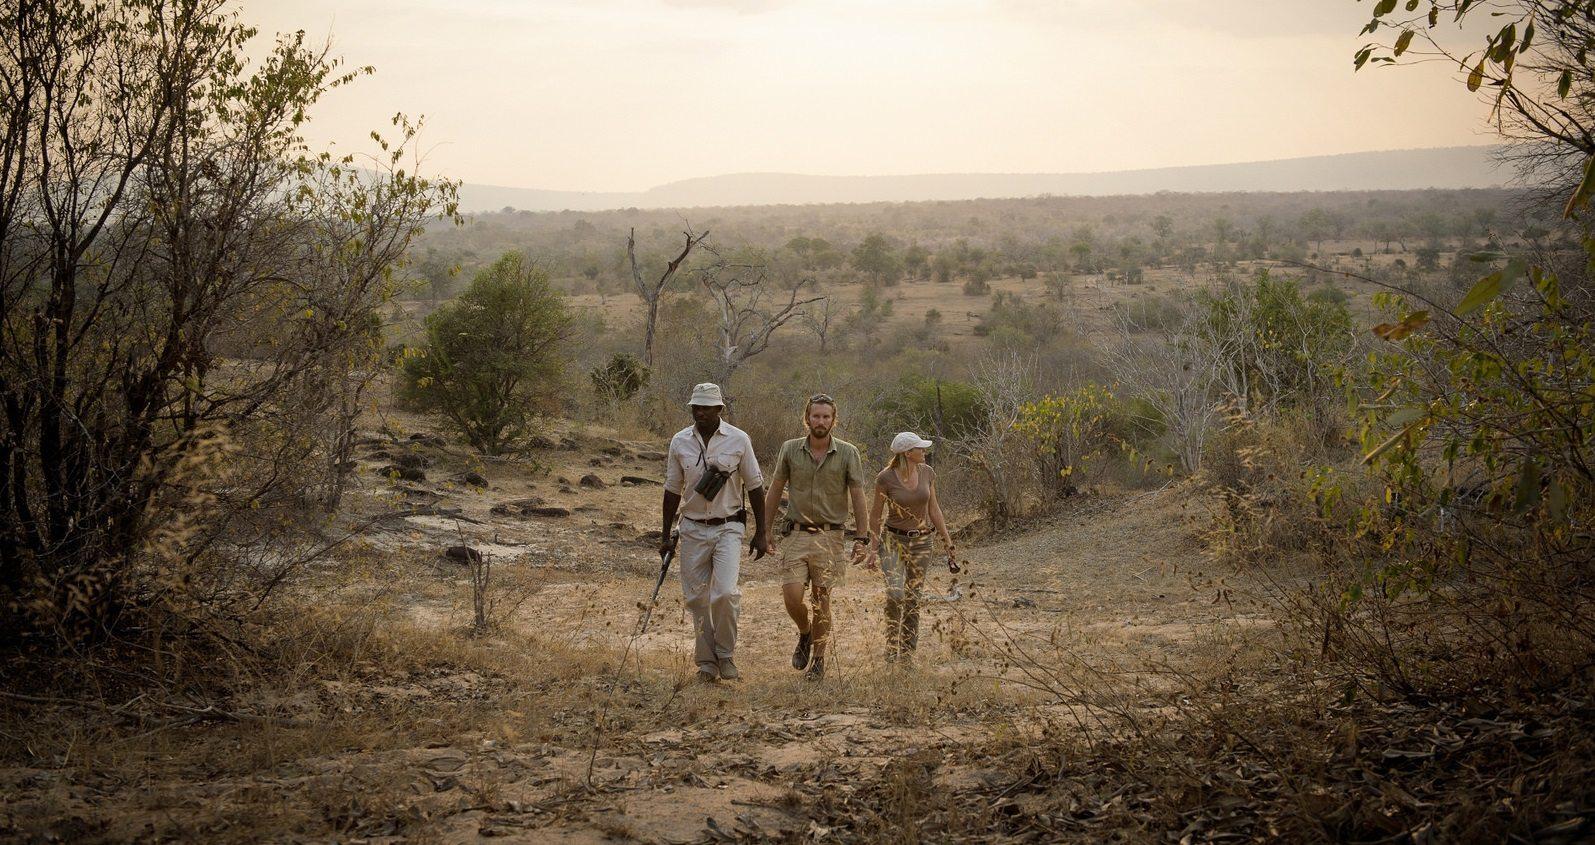 Selous - Nomad Tanzania